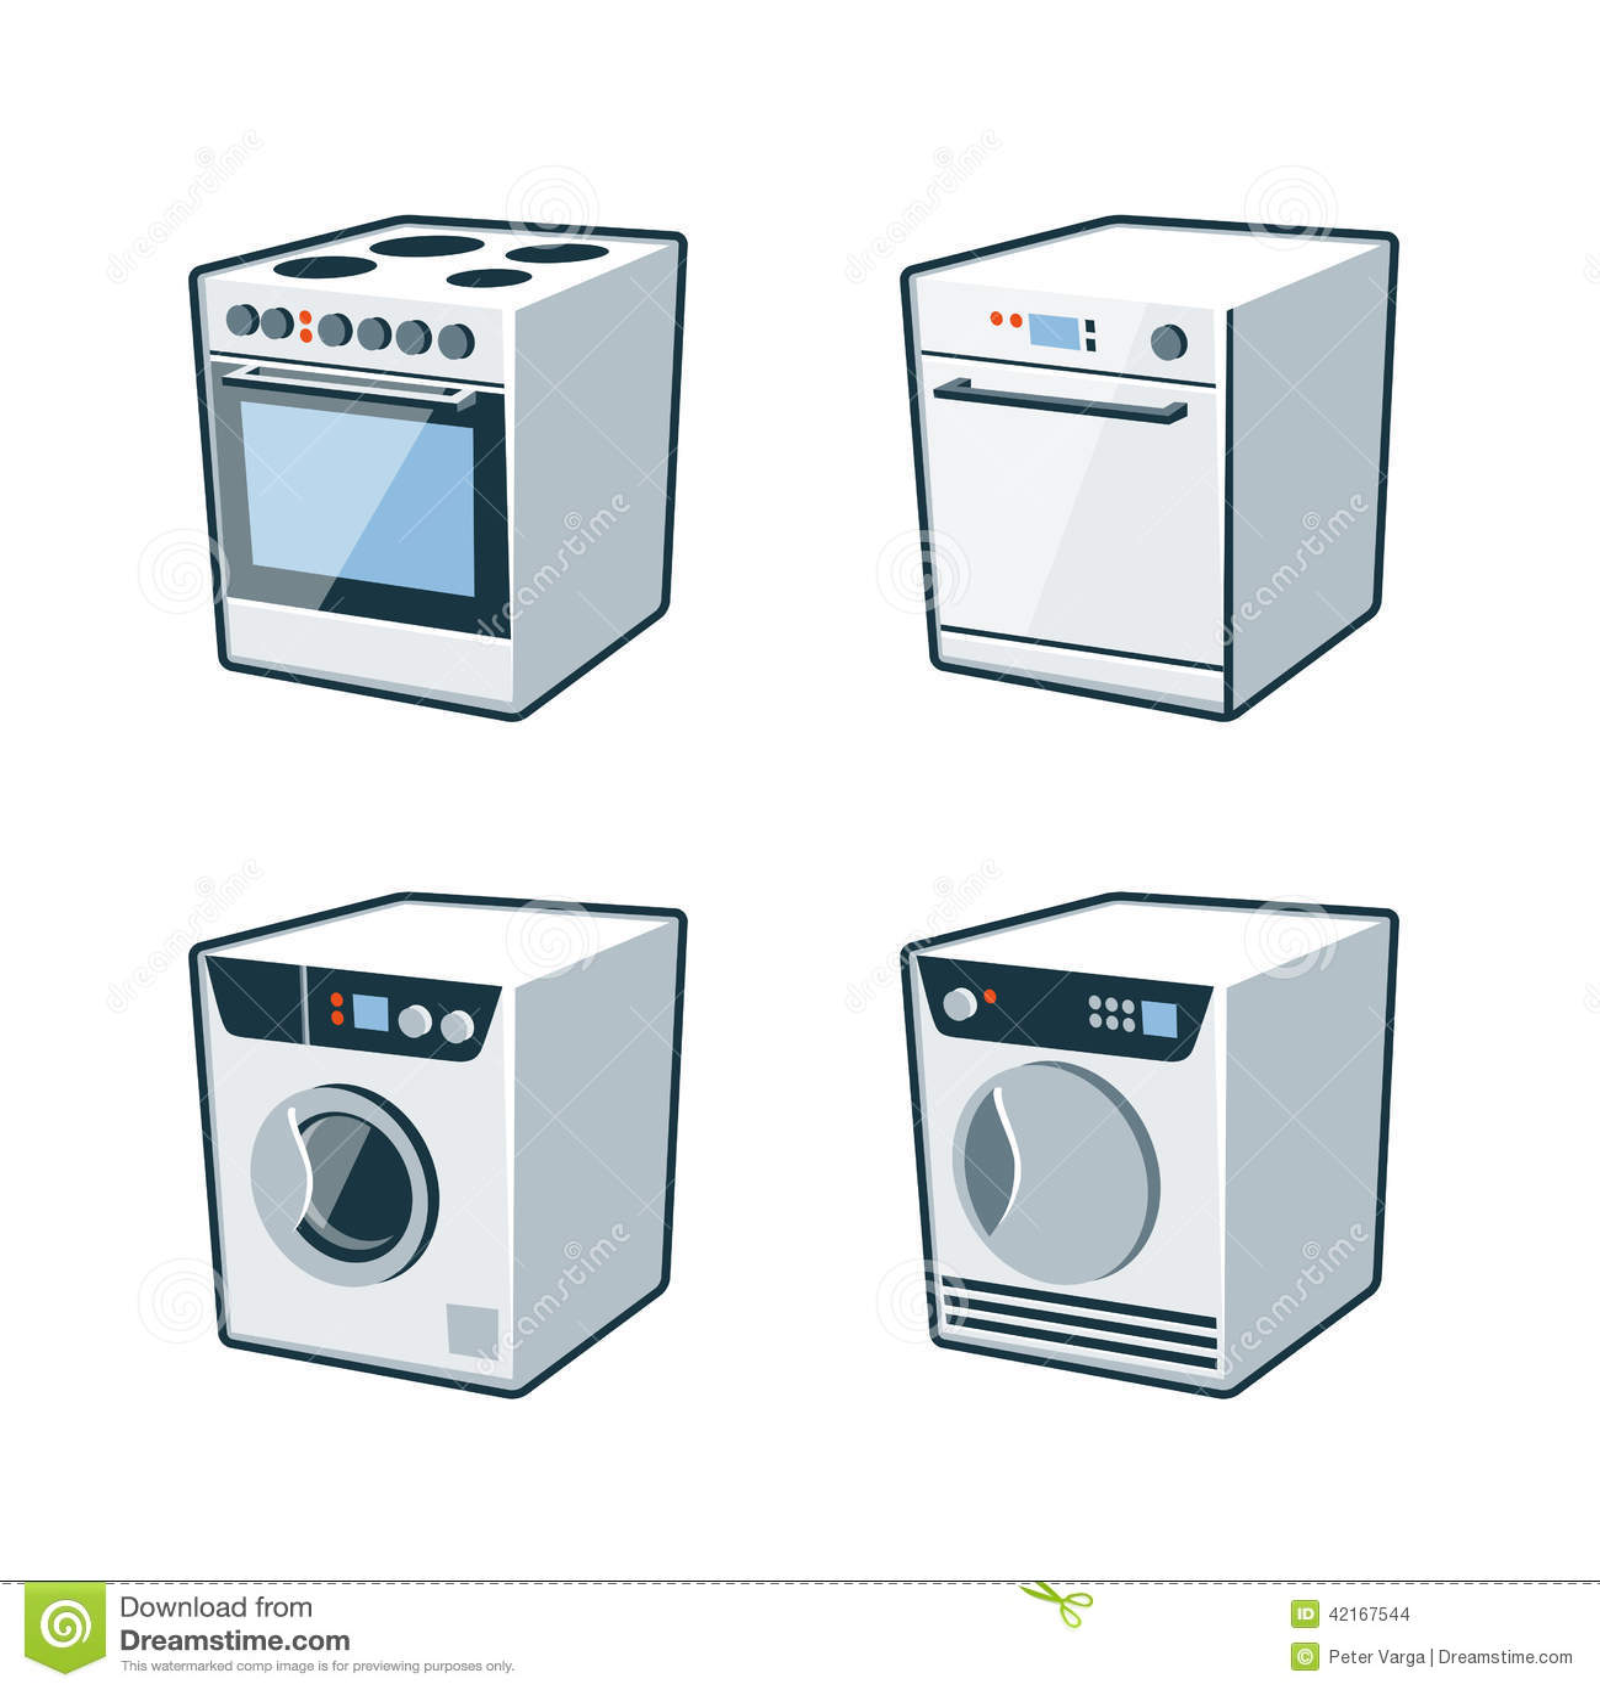 appareils m nagers 2 cuiseur lave vaisselle. Black Bedroom Furniture Sets. Home Design Ideas